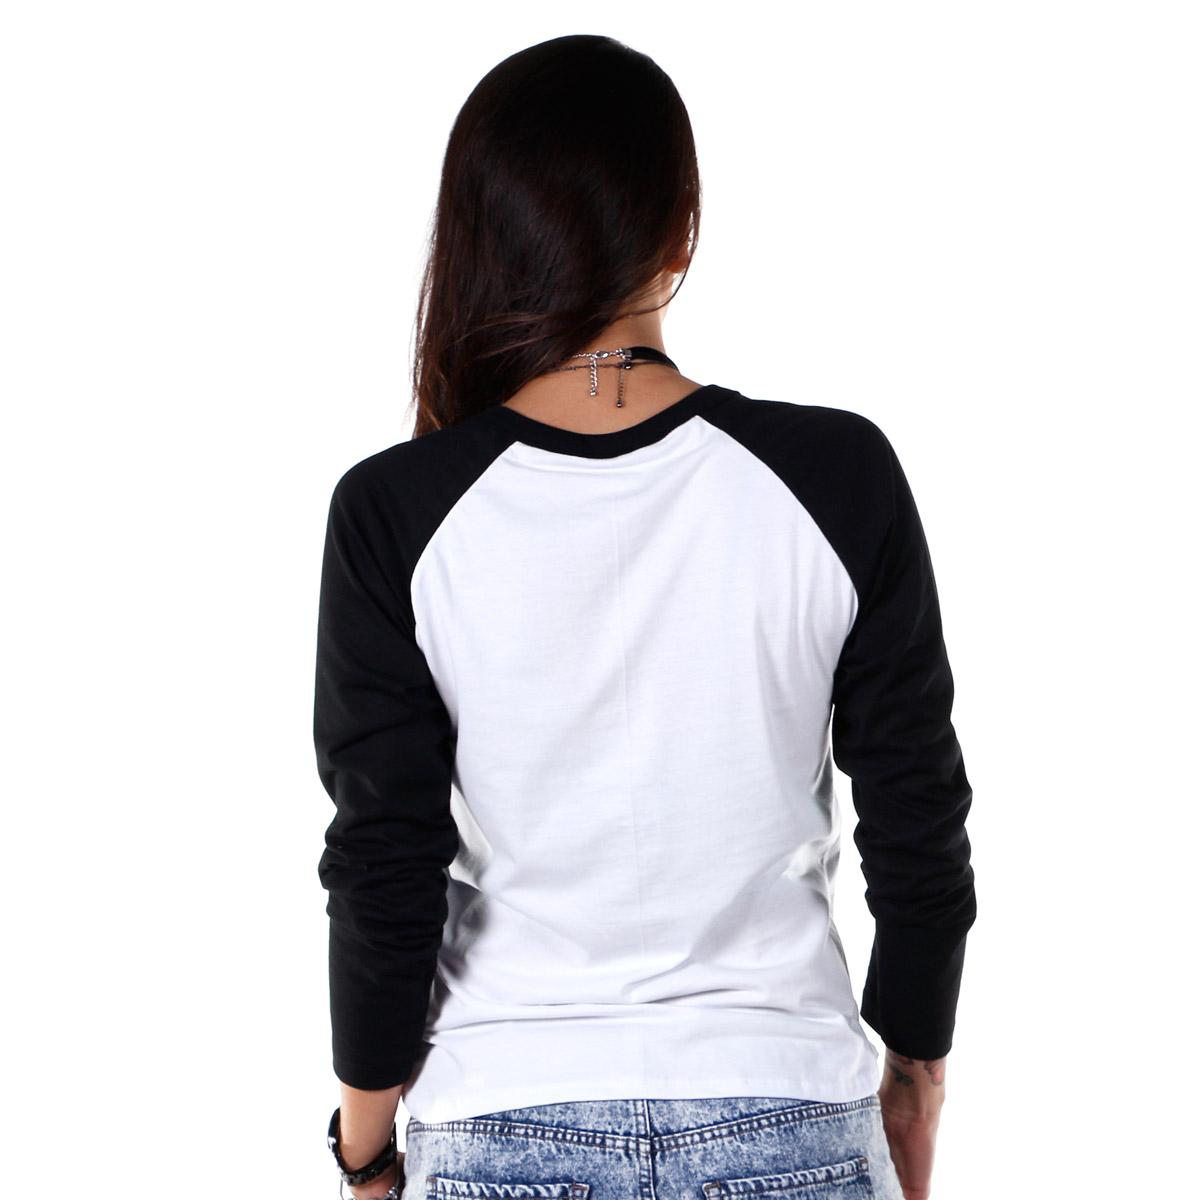 Camiseta Manga Longa Raglan Feminina Fresno Juntos Somos Maré Viva